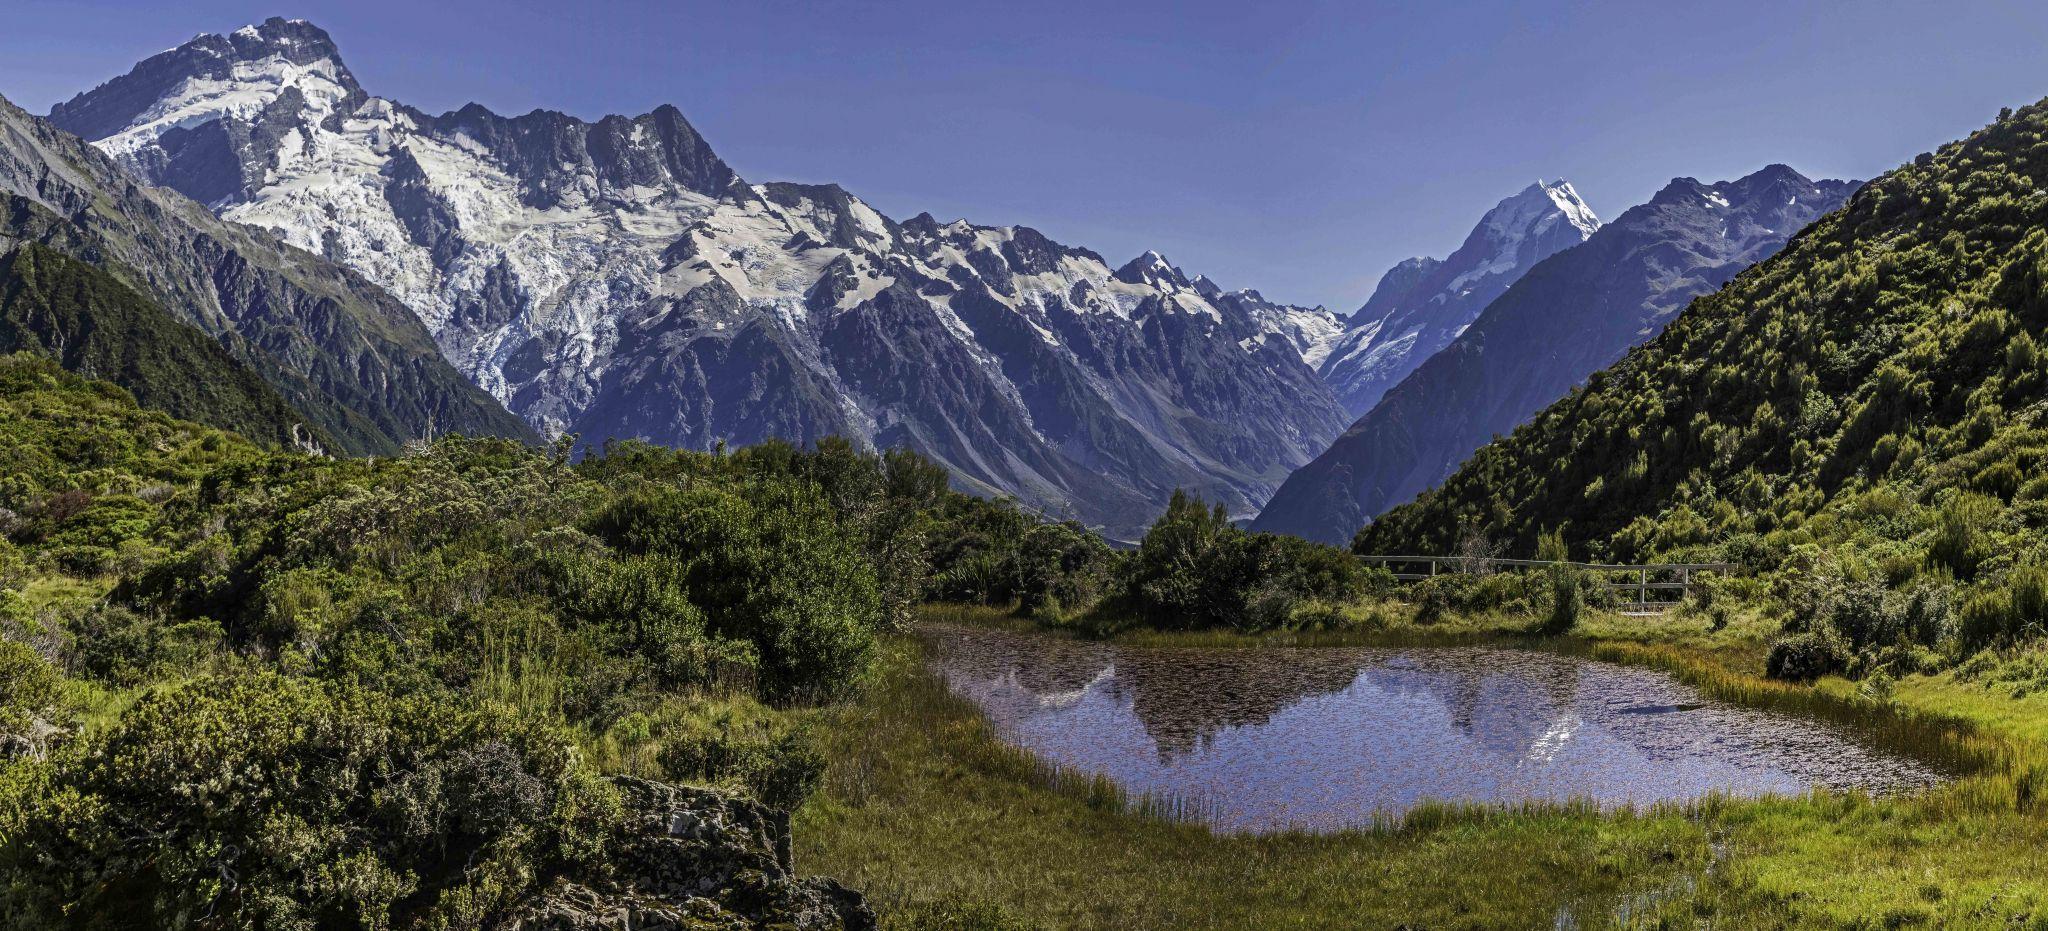 Red Tarns, New Zealand